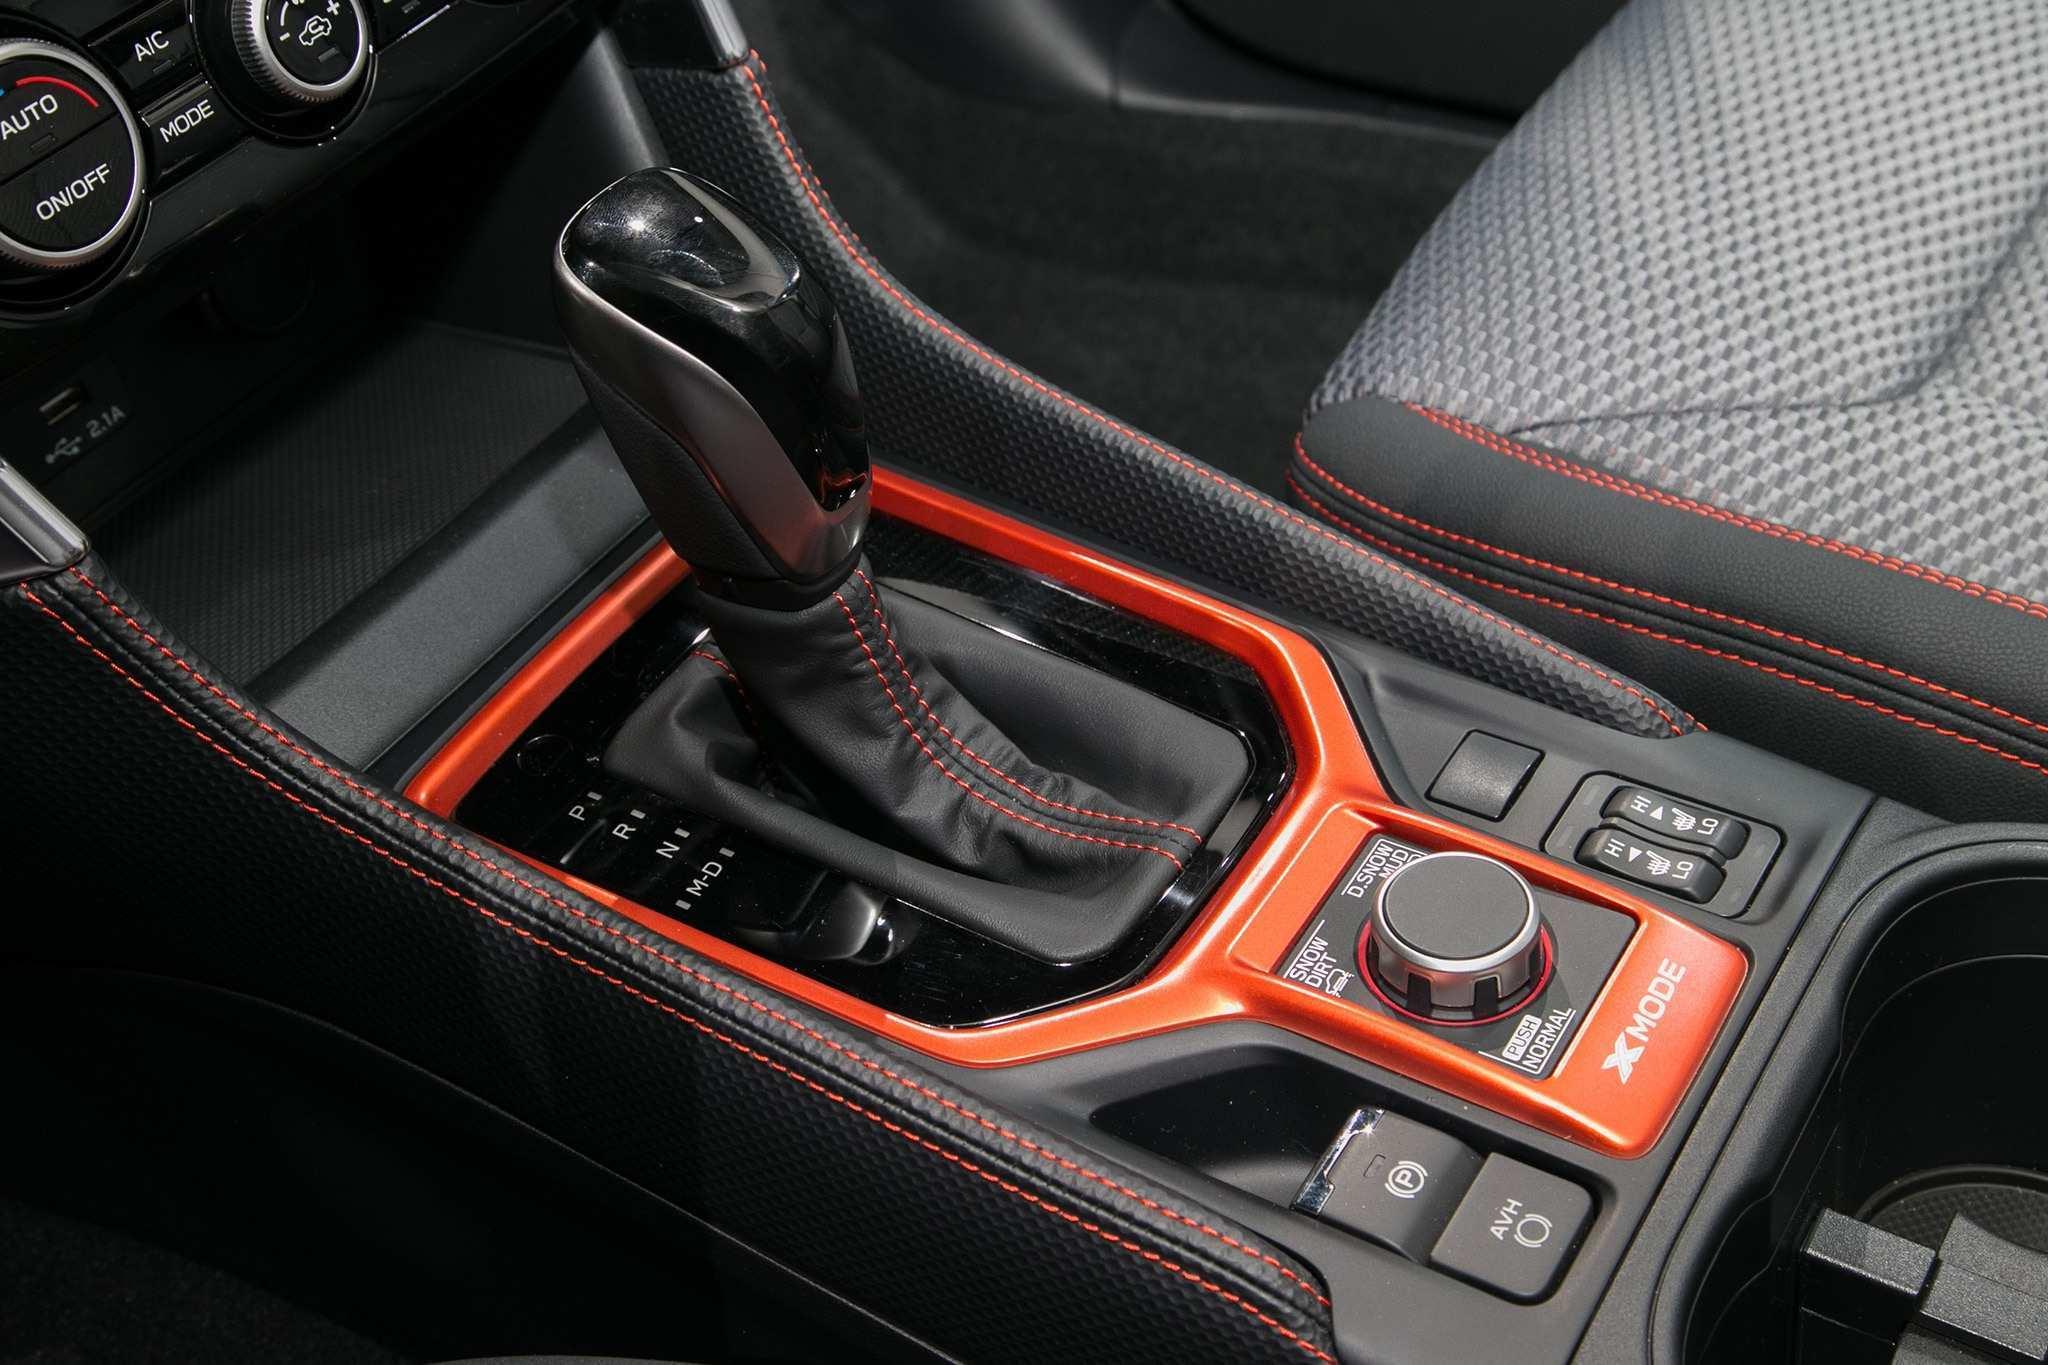 95 New 2019 Subaru Manual Transmission Price and Review with 2019 Subaru Manual Transmission